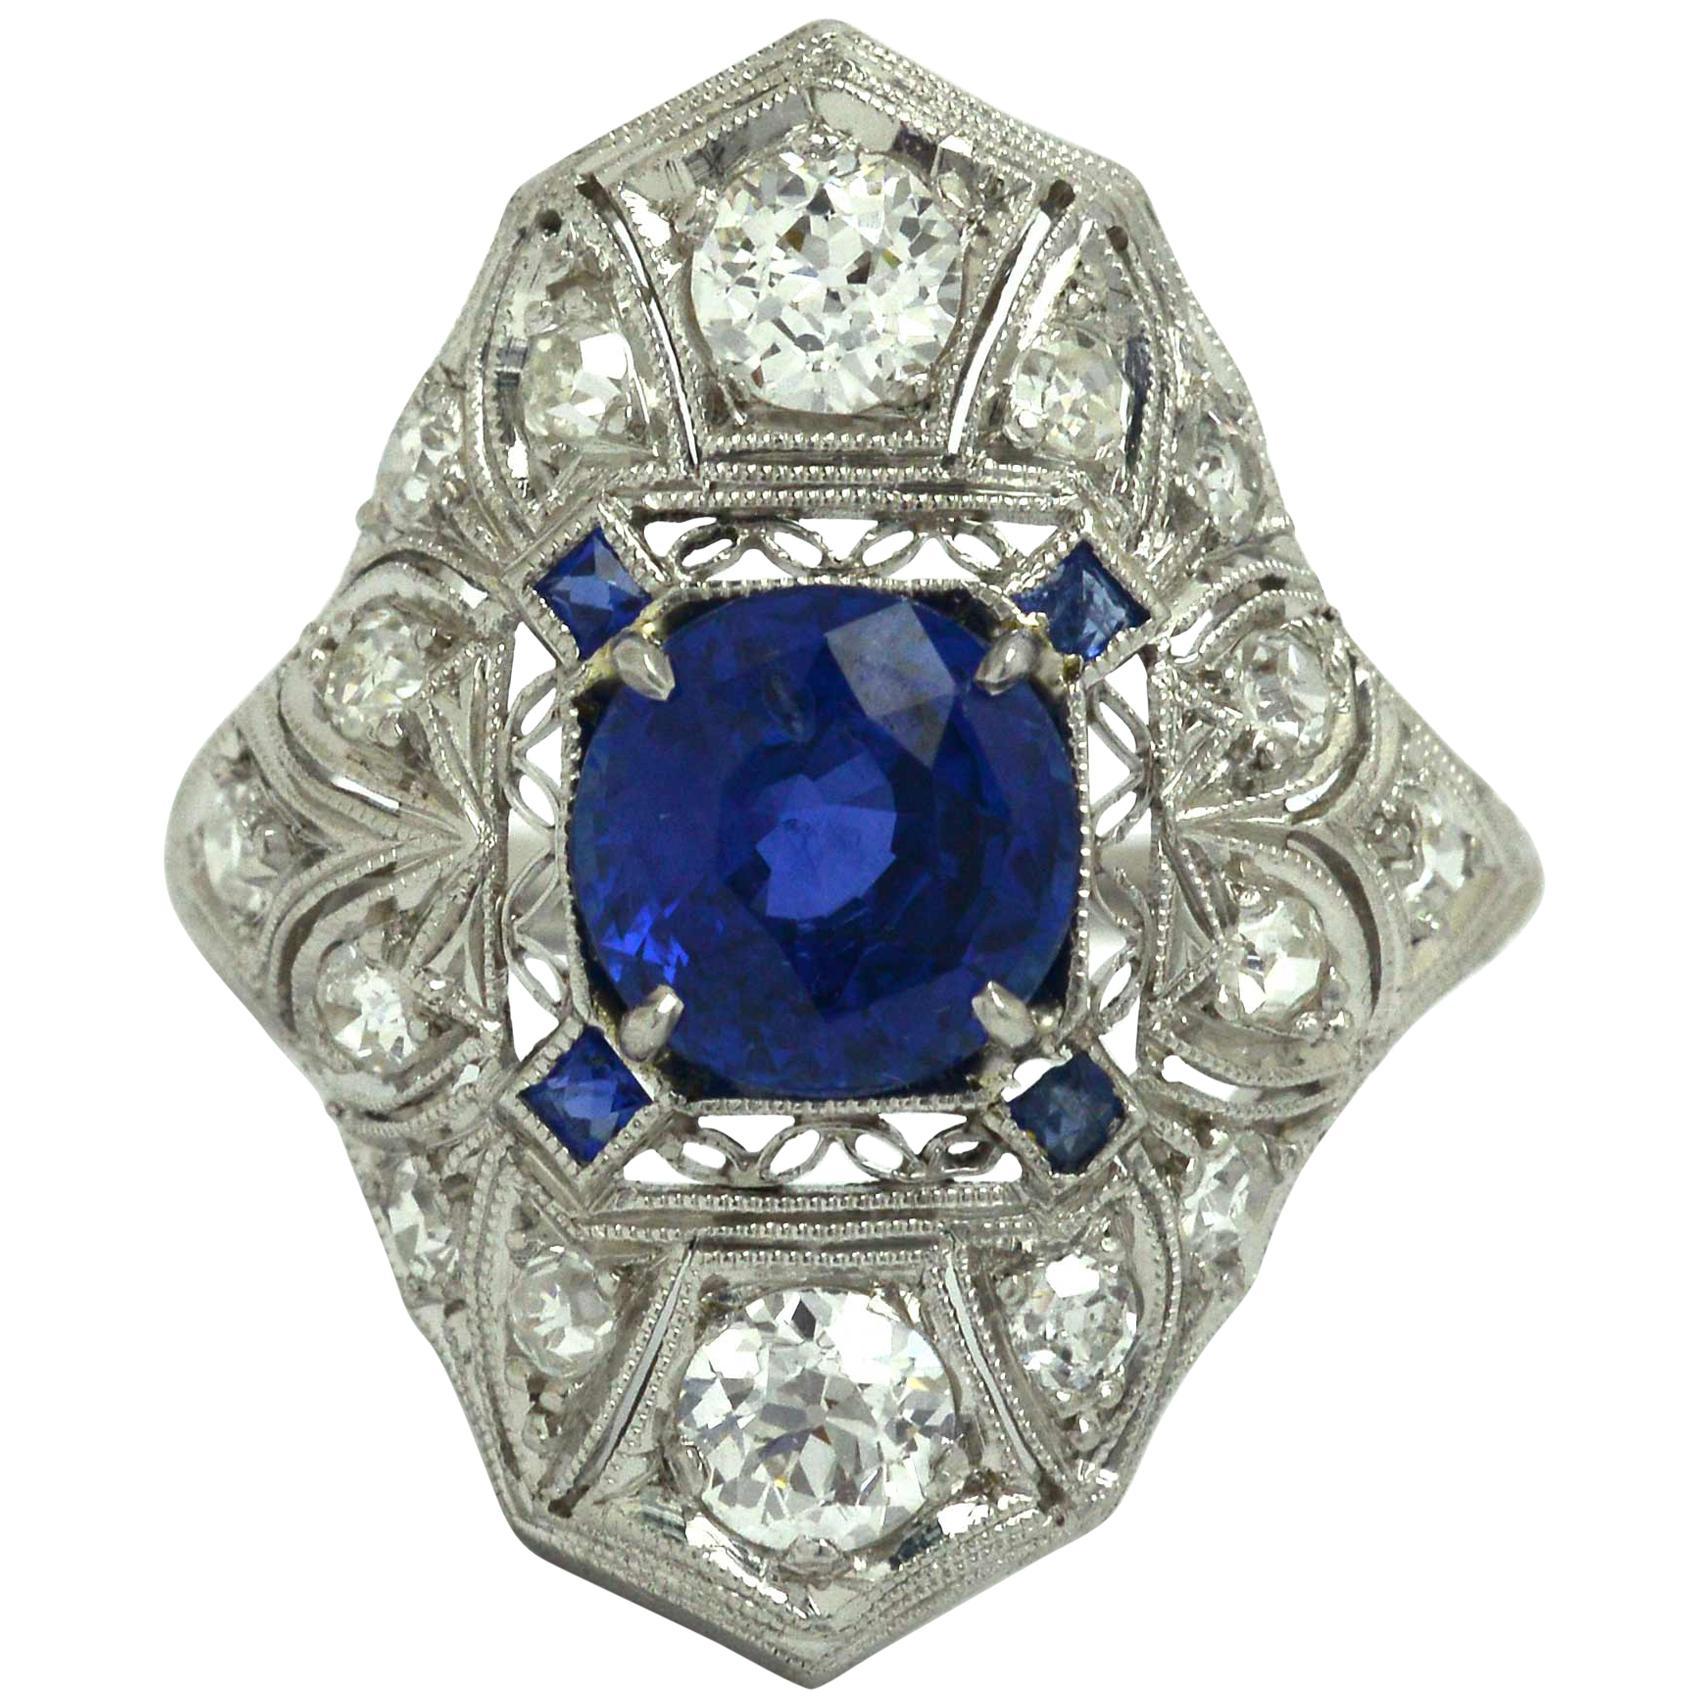 Filigree Antique Sapphire Engagement Ring Cocktail Art Deco Edwardian Platinum